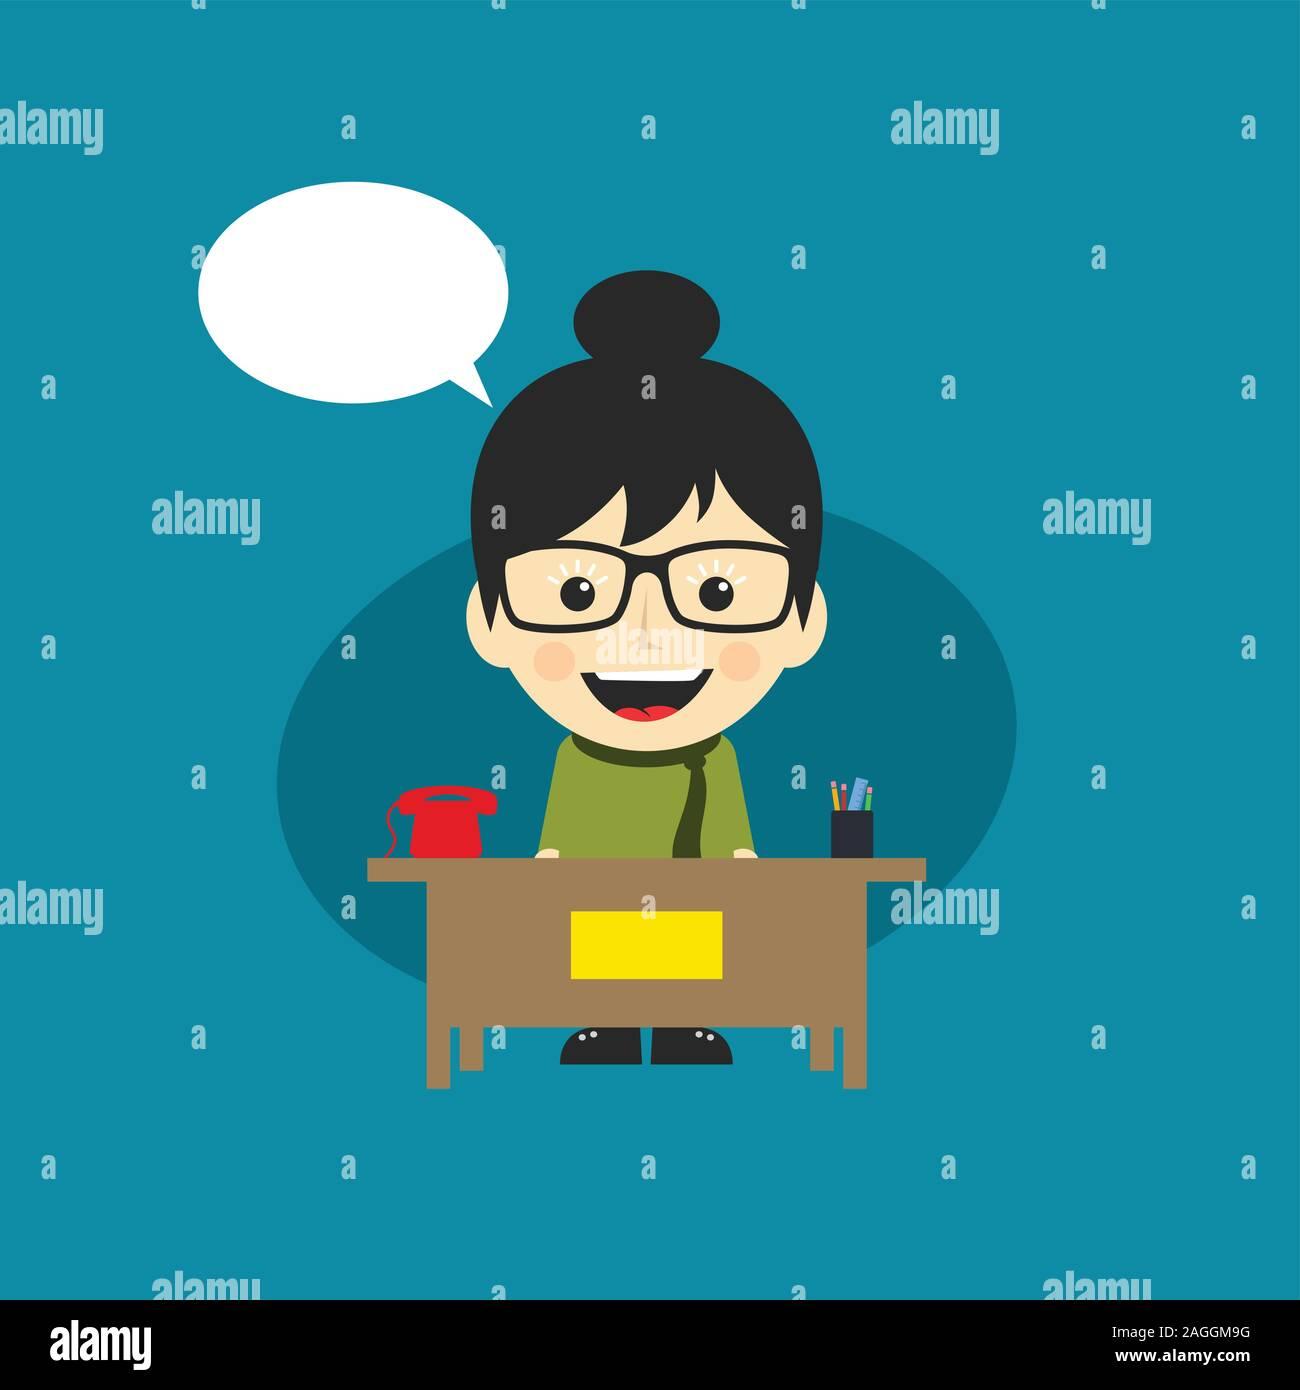 Happy Customer Service Receptionist Cartoon Character Vector Art Stock Vector Image Art Alamy